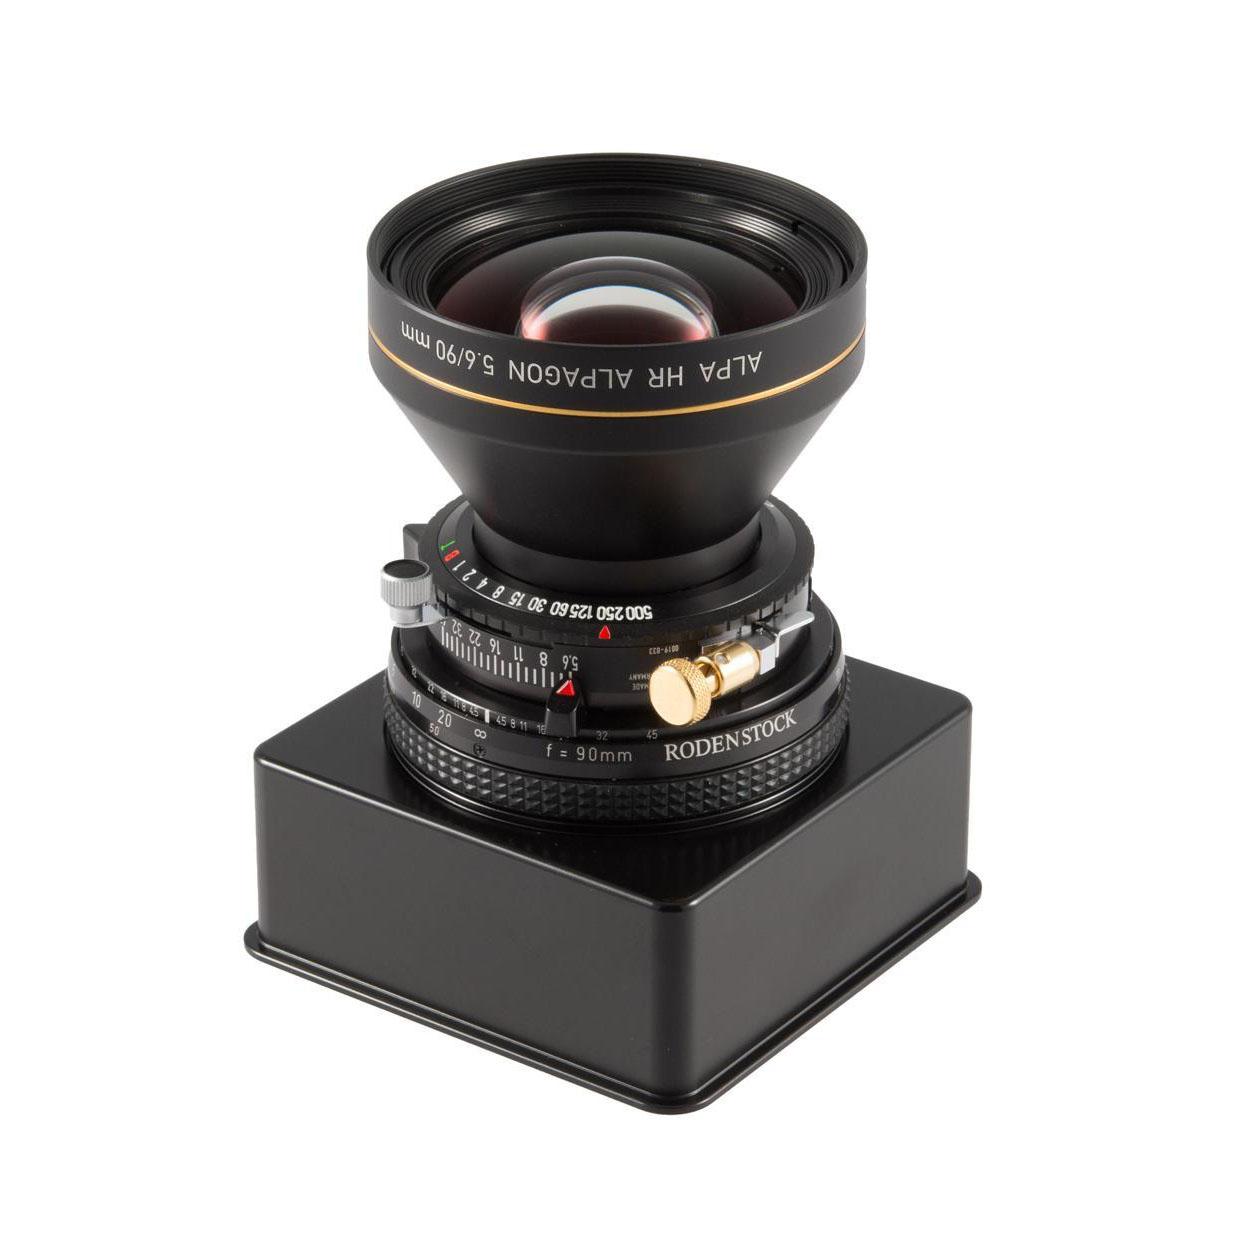 Rodenstock / ALPA HR Alpagon 5.6/90 mm, SB34